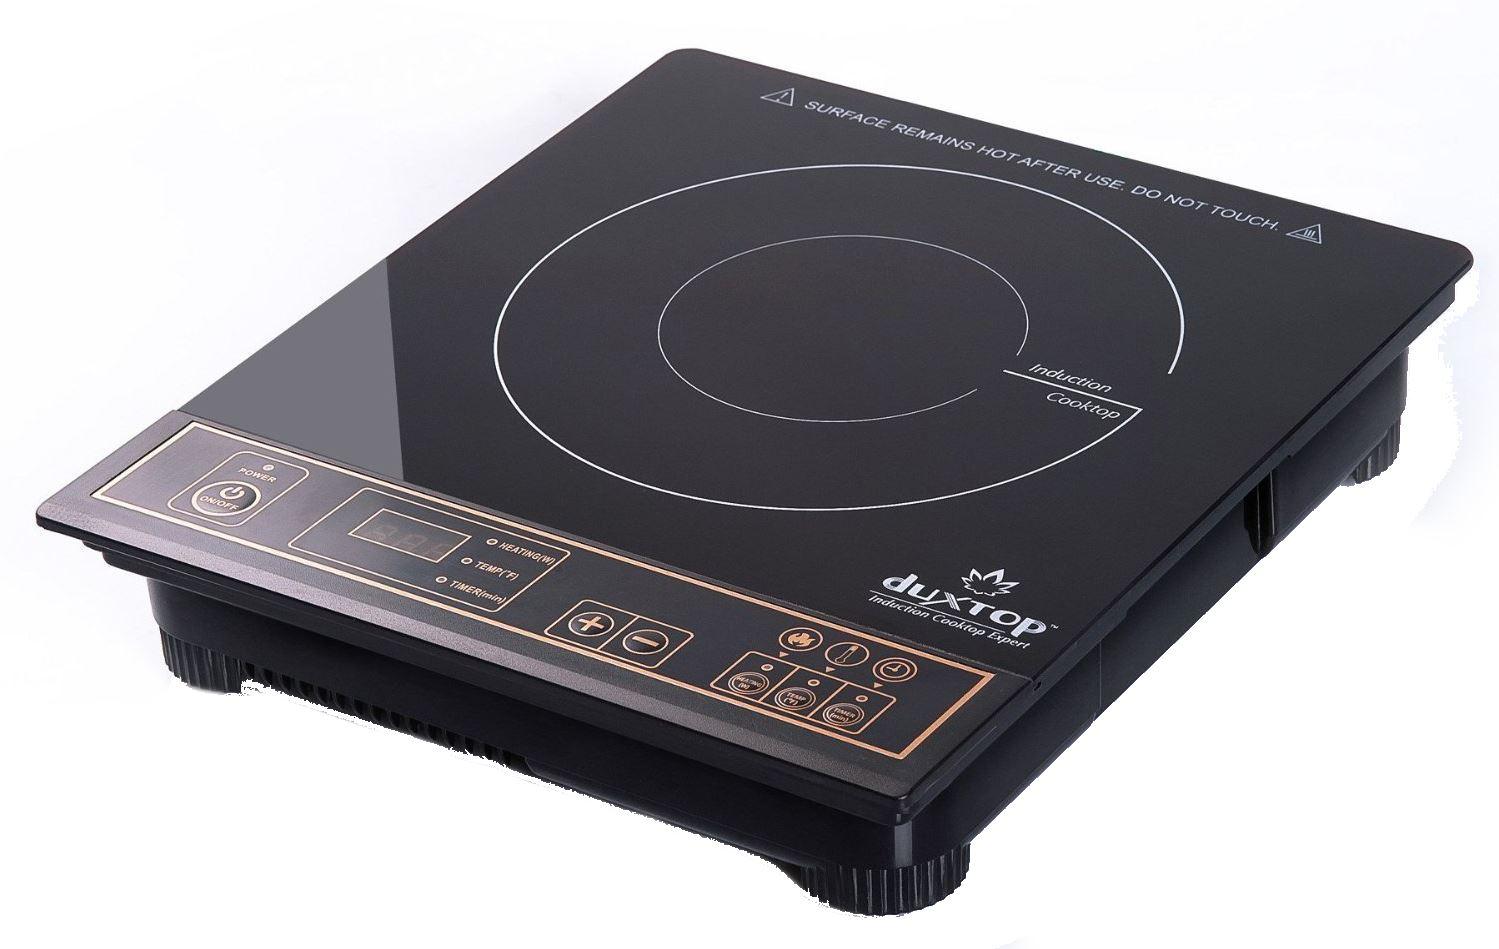 electric stove hanabishi secura 8100 portable electric cooktop the best picks for portable electric stove kitchen times